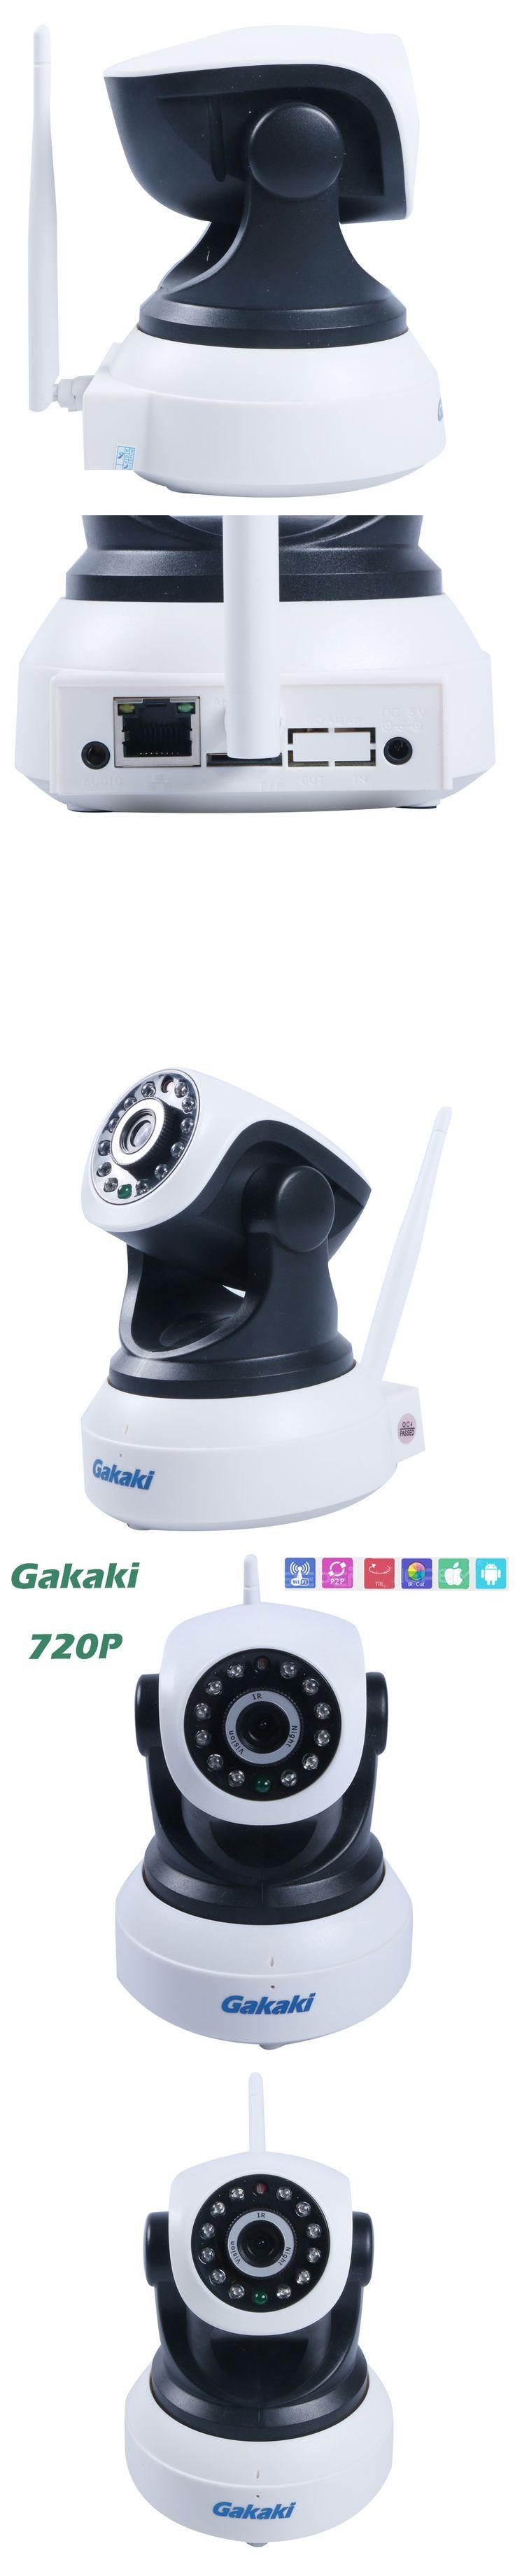 HD 720P IP Camera Wifi cam Mini CCTV P2P network Camera Micro TF Card Camerahome security camera system wireless